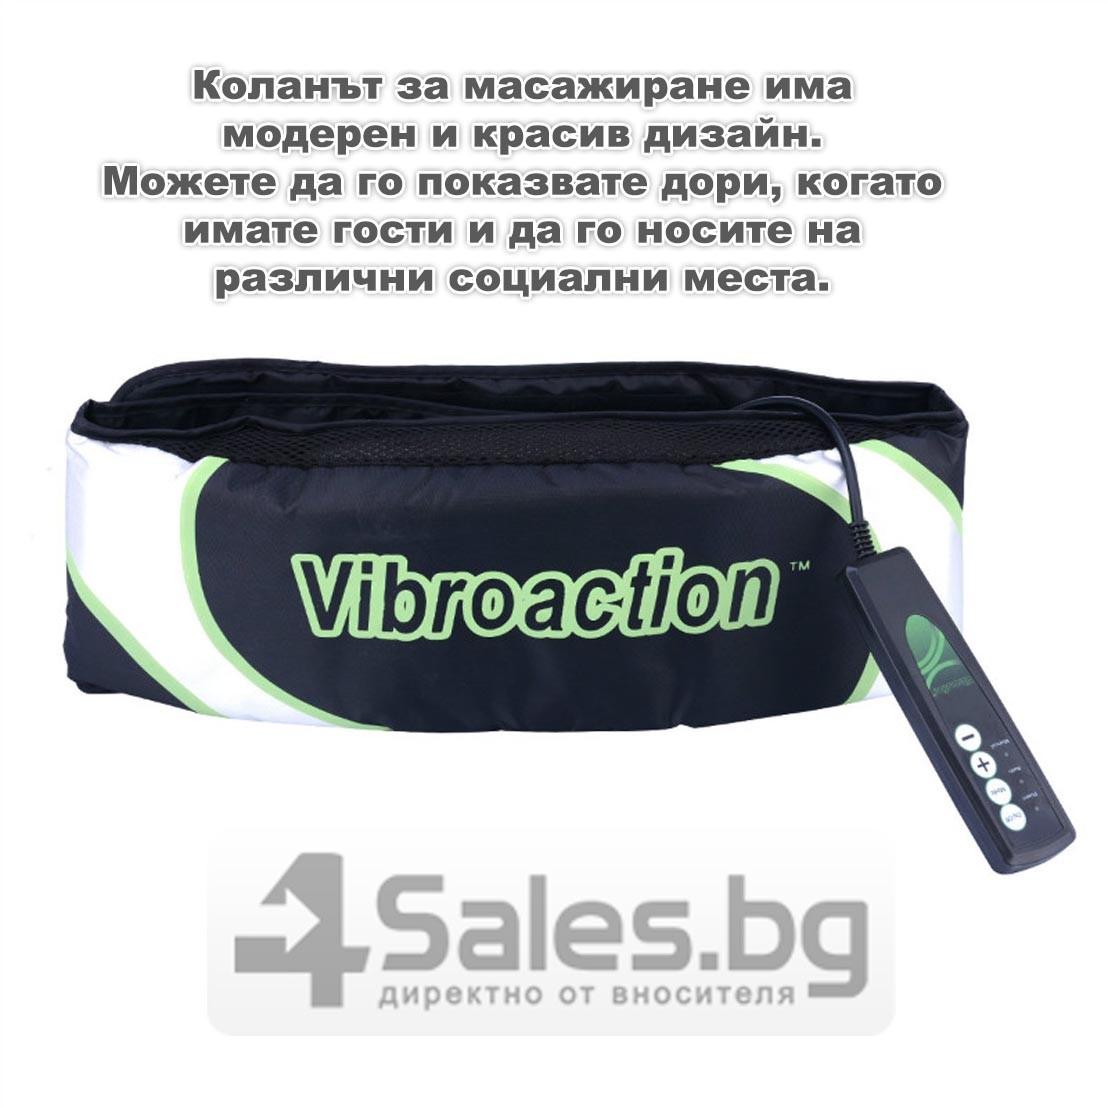 Вибромасажен колан – Vibroaction tv78 17